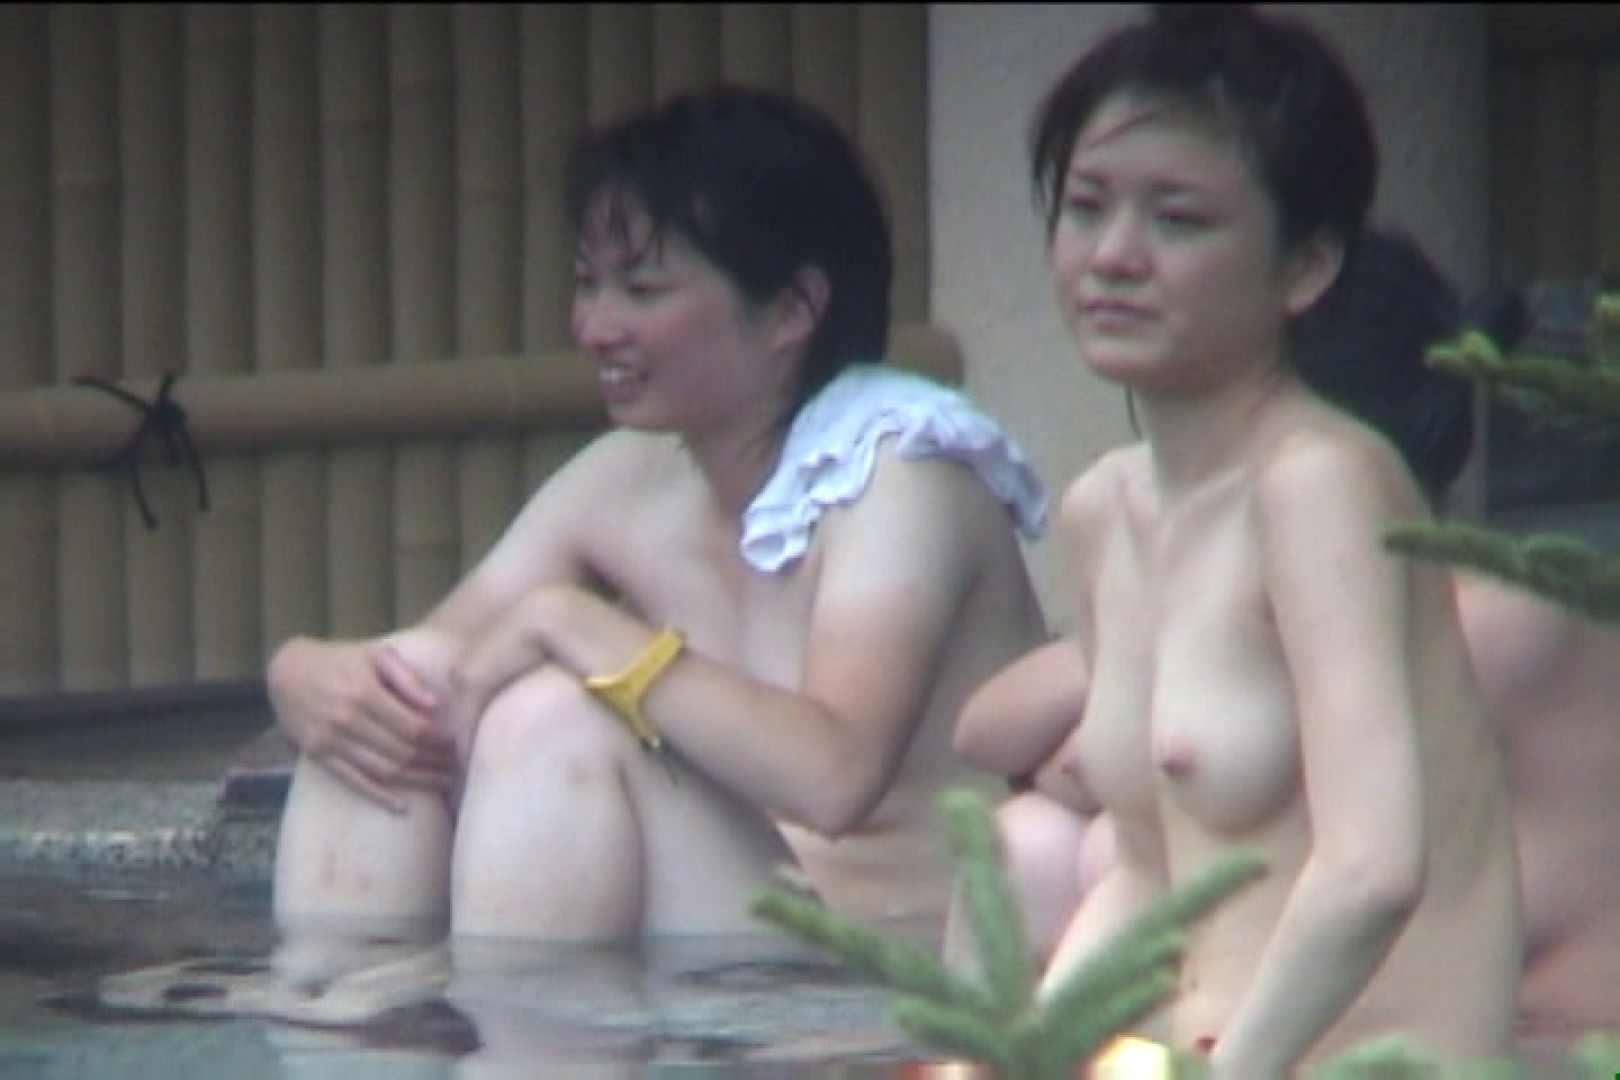 Aquaな露天風呂Vol.94【VIP限定】 盗撮 性交動画流出 20連発 8